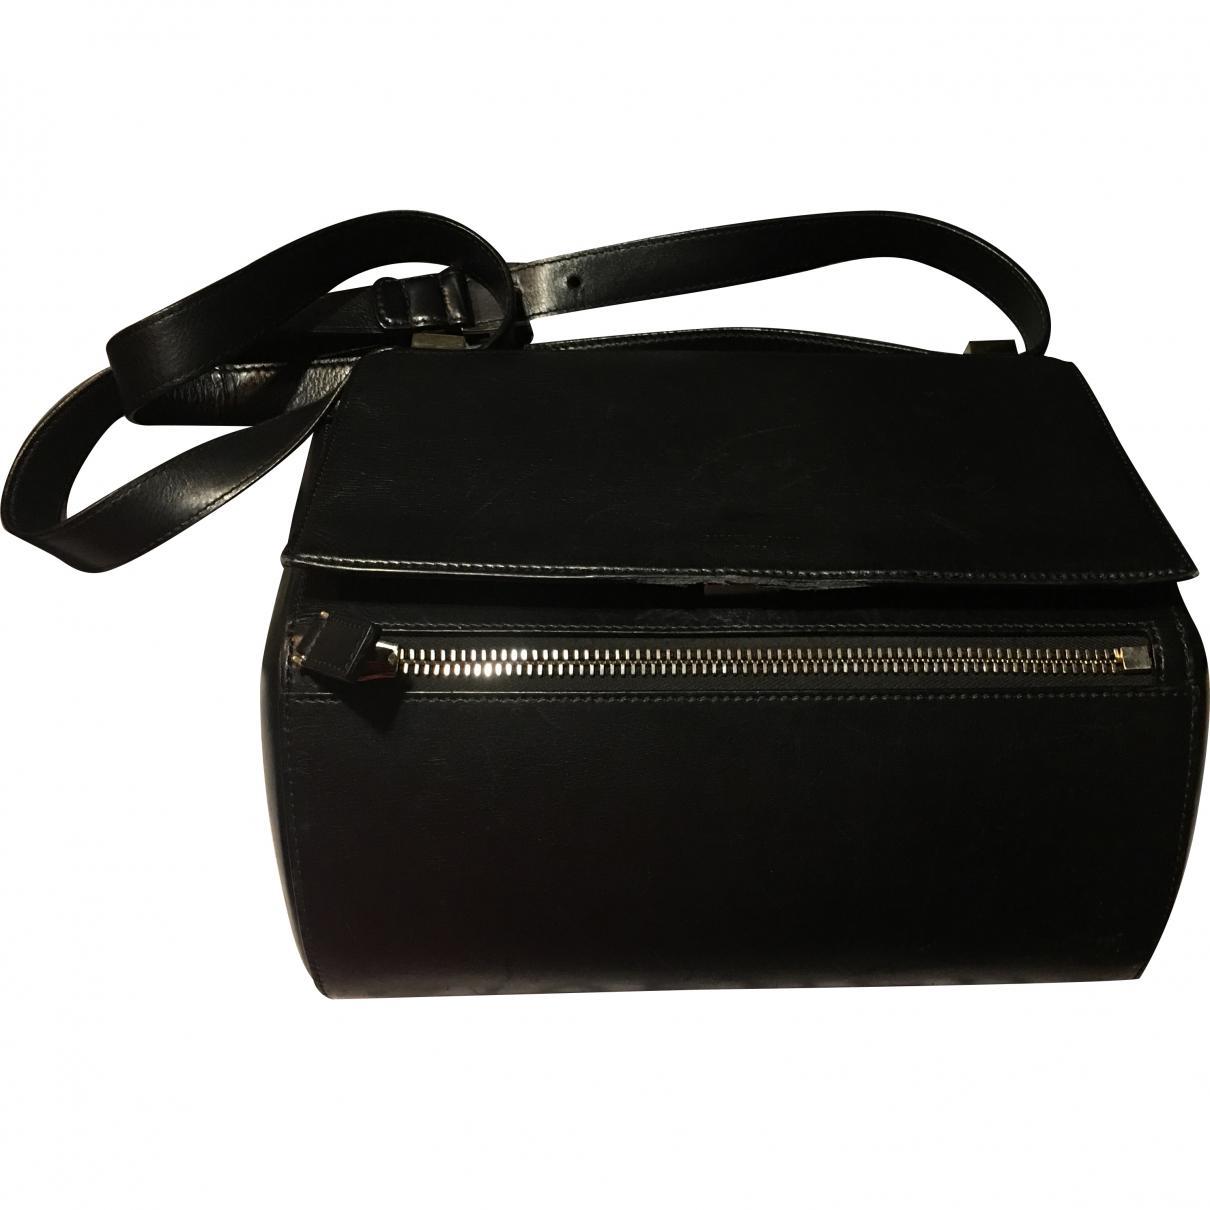 fe1f2c254486 Lyst - Givenchy Pandora Box Leather Crossbody Bag in Black